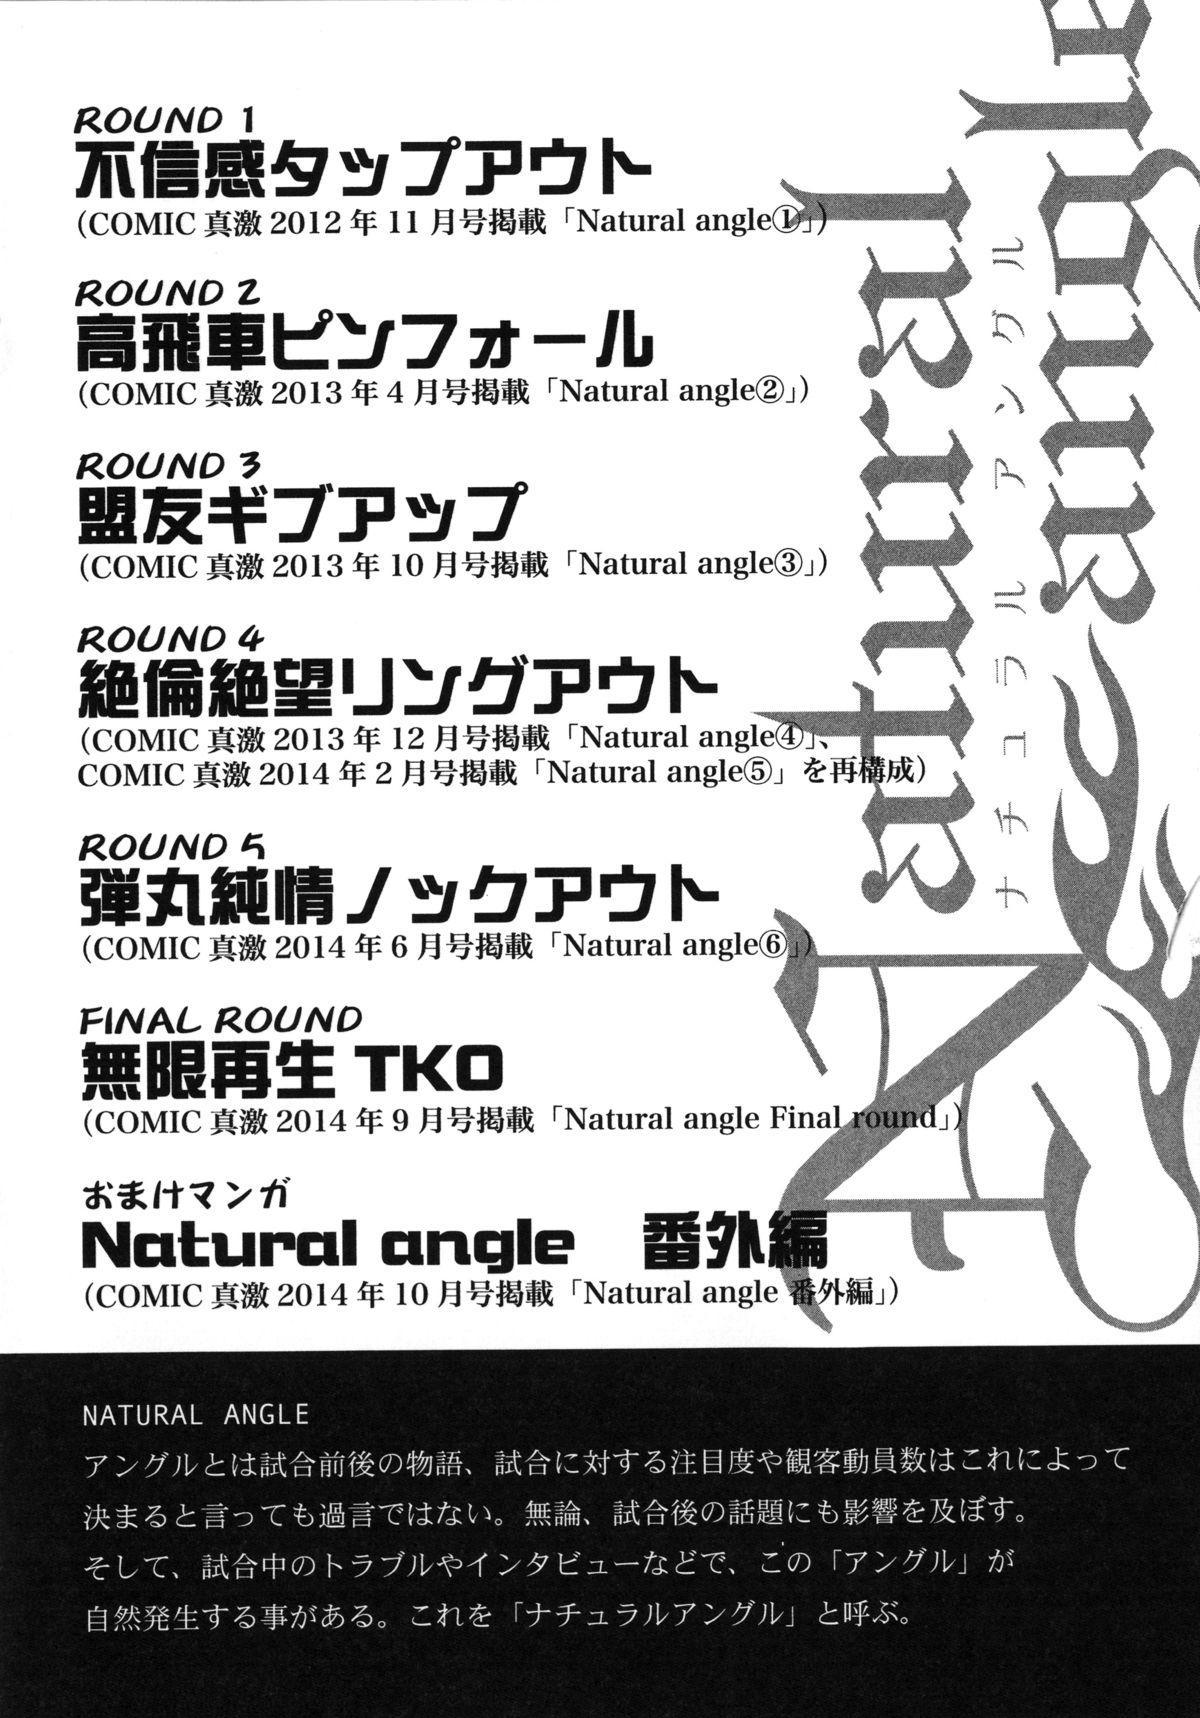 [Yoshimura Tatsumaki] Monzetsu Taigatame ~Count 3 de Ikasete Ageru~ | Faint in Agony Bodylock ~I'll make you cum on the count of 3~ [English] [Brolen] 12